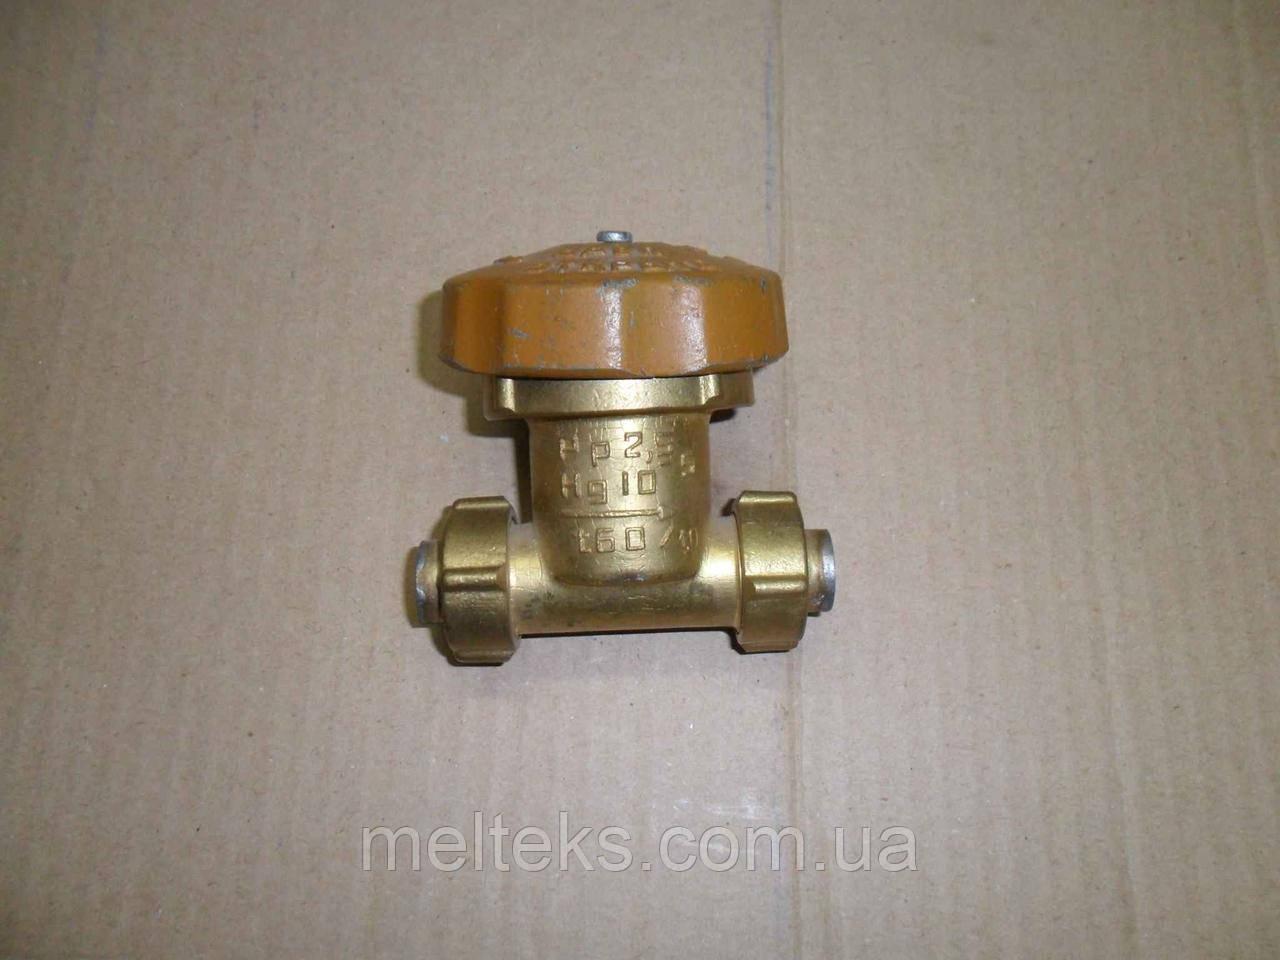 Вентиль клапан СК 26013